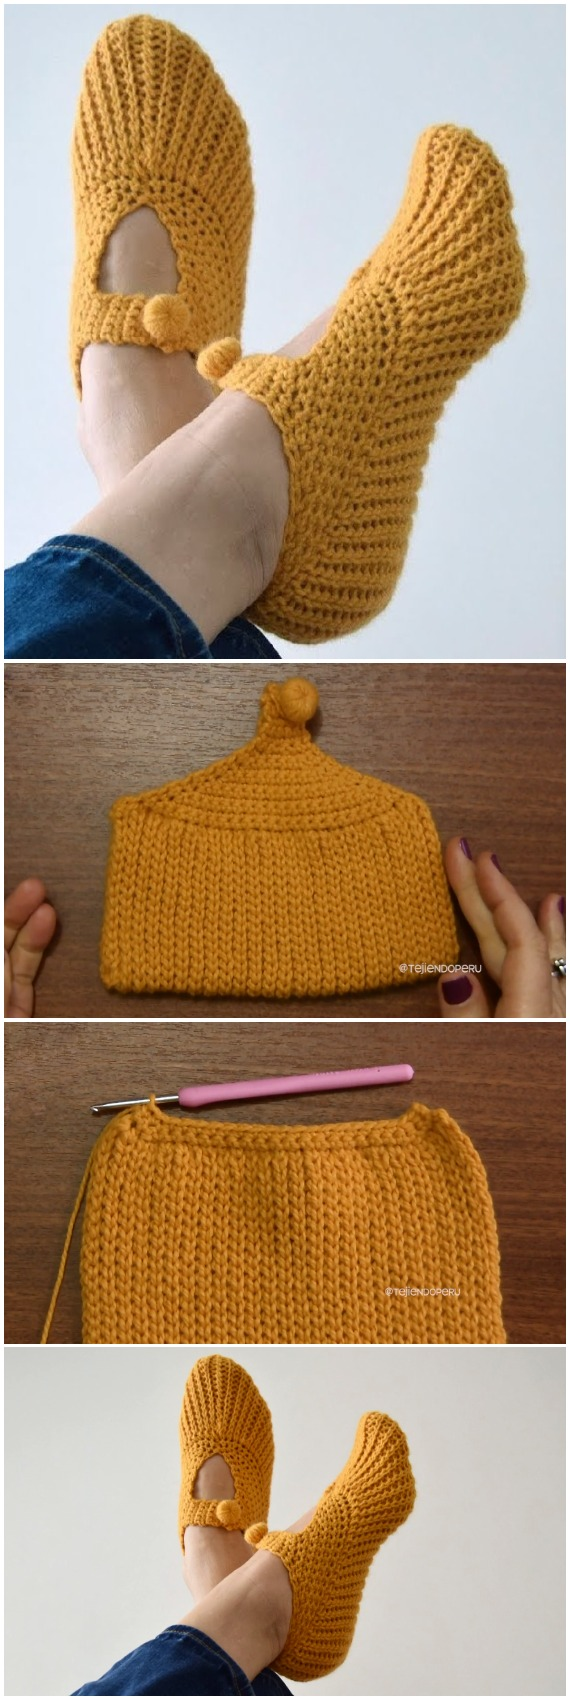 Crochet Pocketbook Slippers